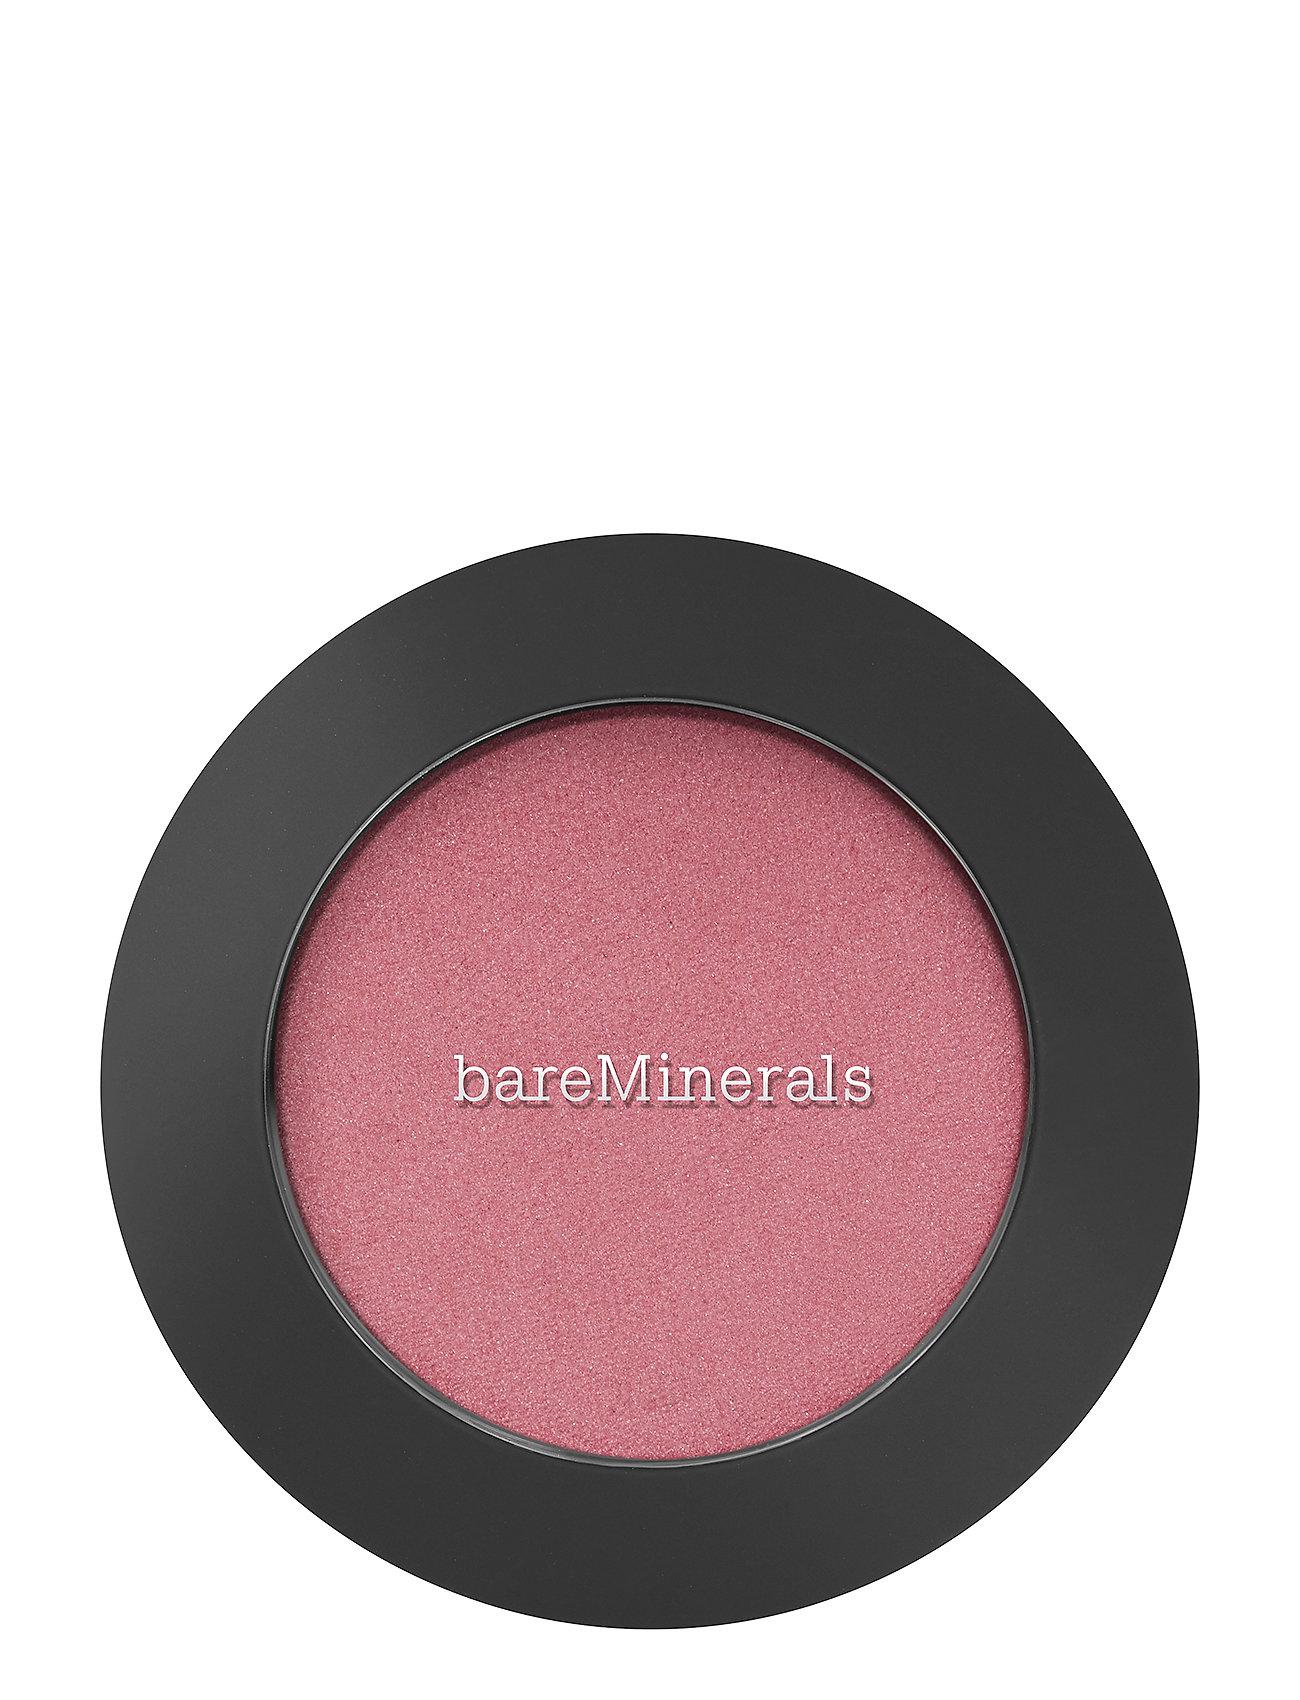 Image of Bounce & Blur Blush Mauve Sunrise Beauty WOMEN Makeup Face Blush Lyserød BareMinerals (3270673177)